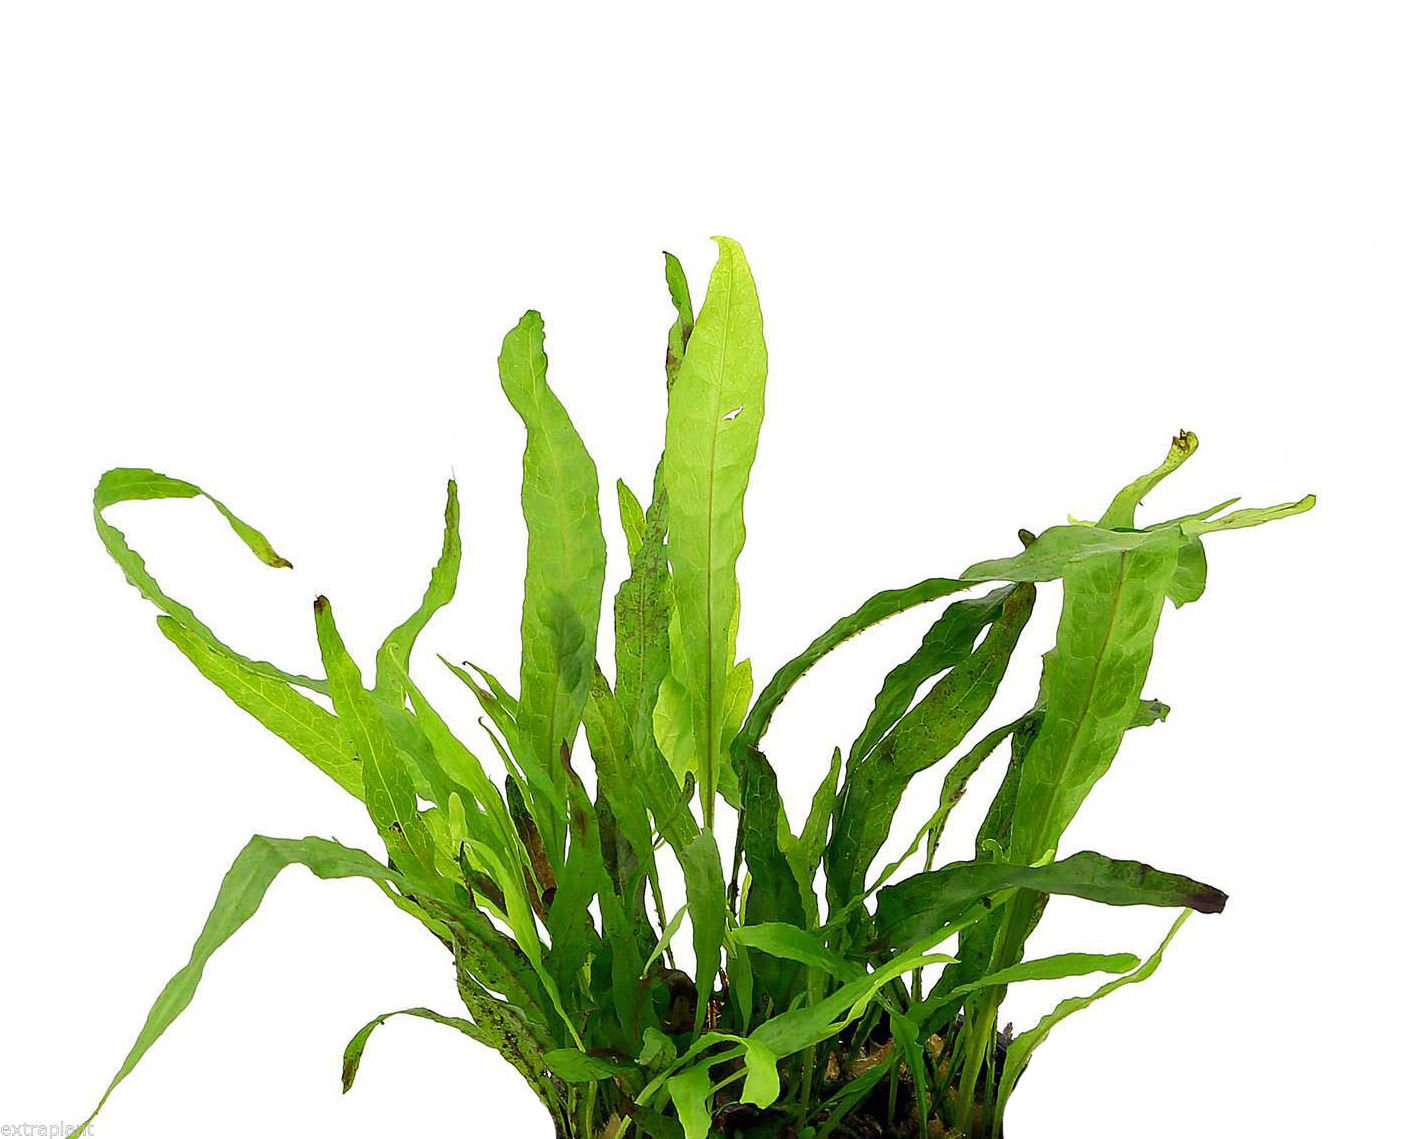 40+ Leaves Java Fern Microsorum Pteropus Live Aquarium Plants BUY2GET1FREE